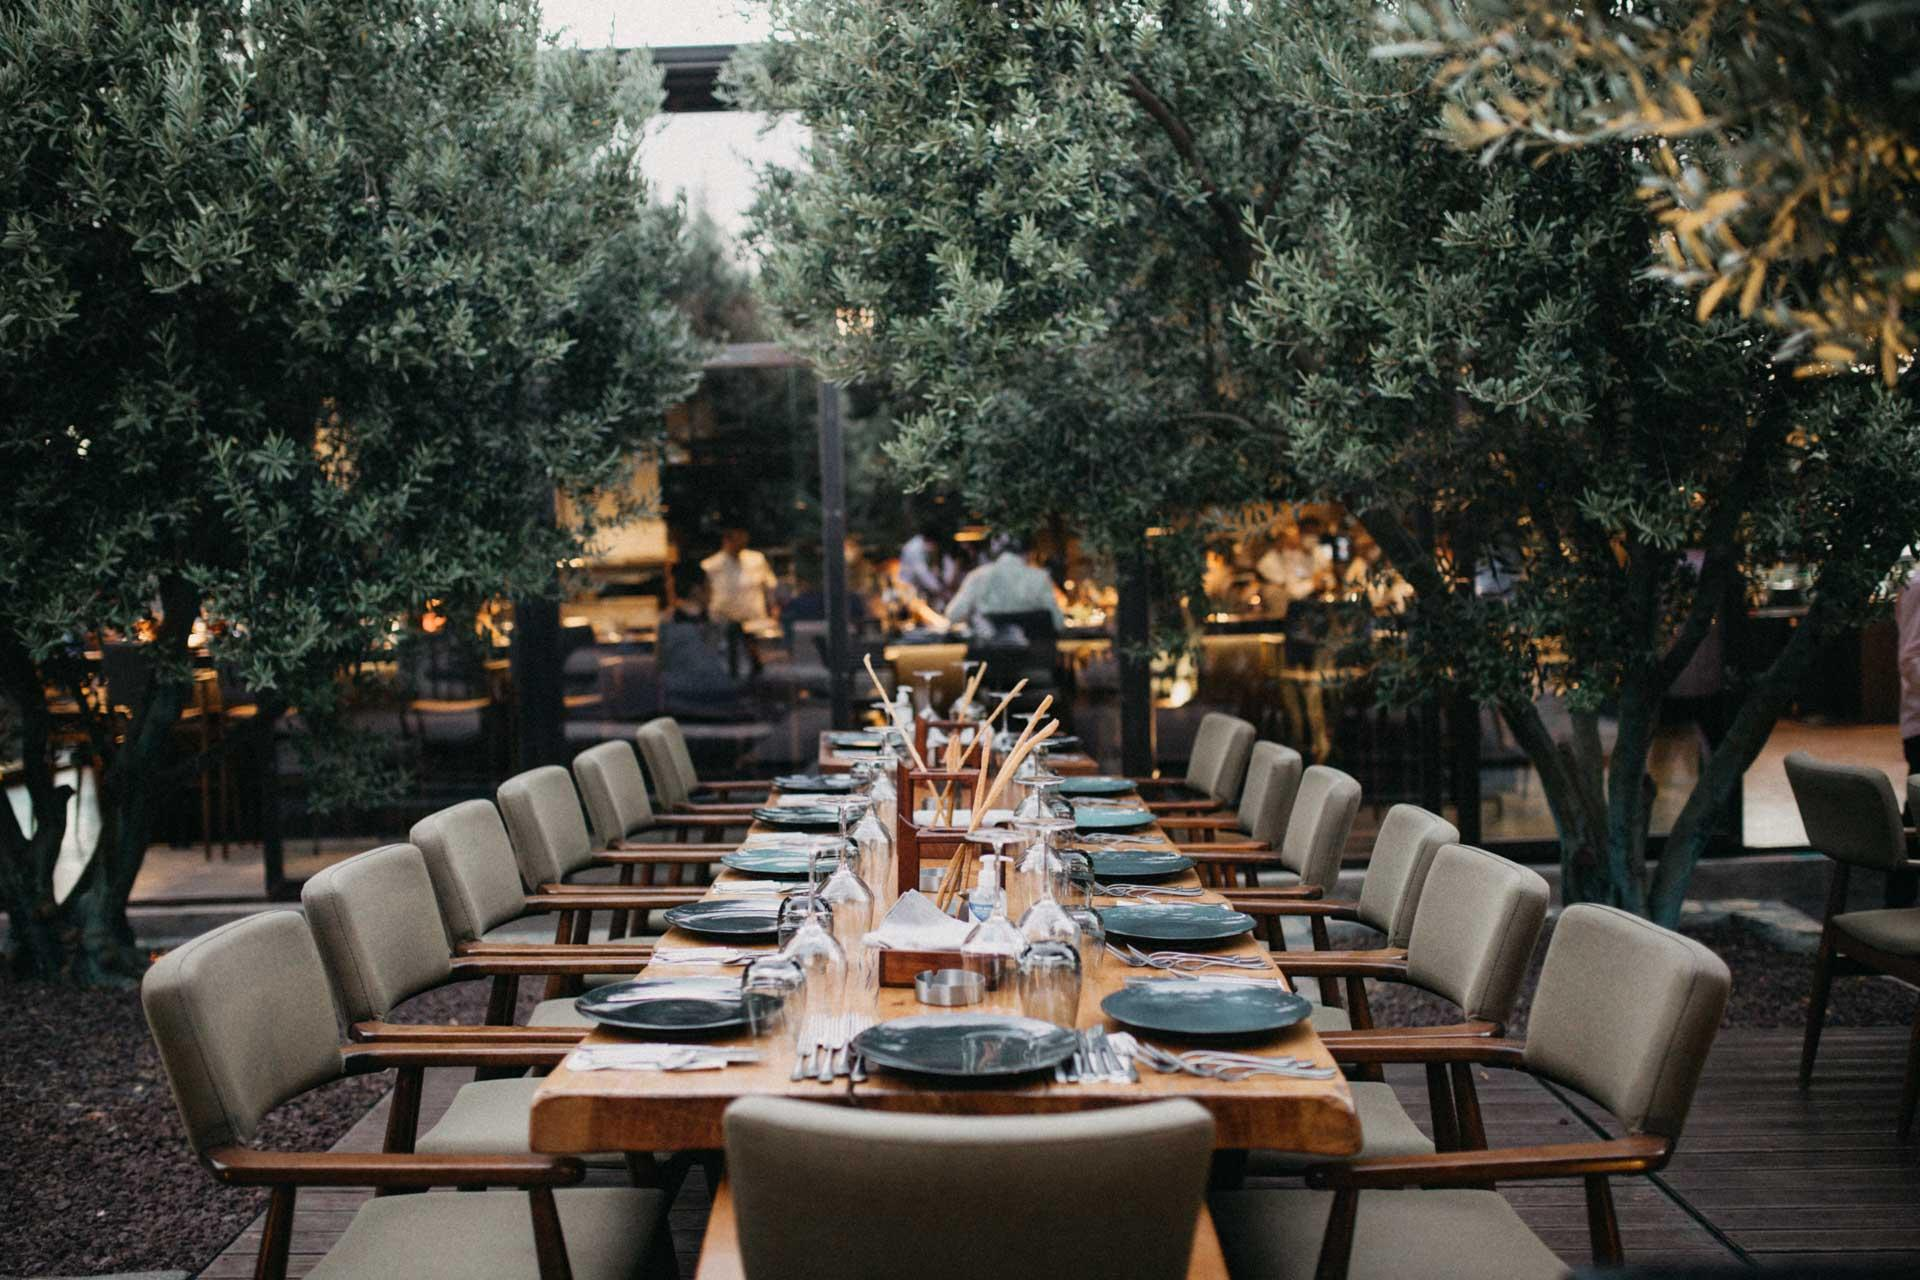 OD Urla - view of the restaurant